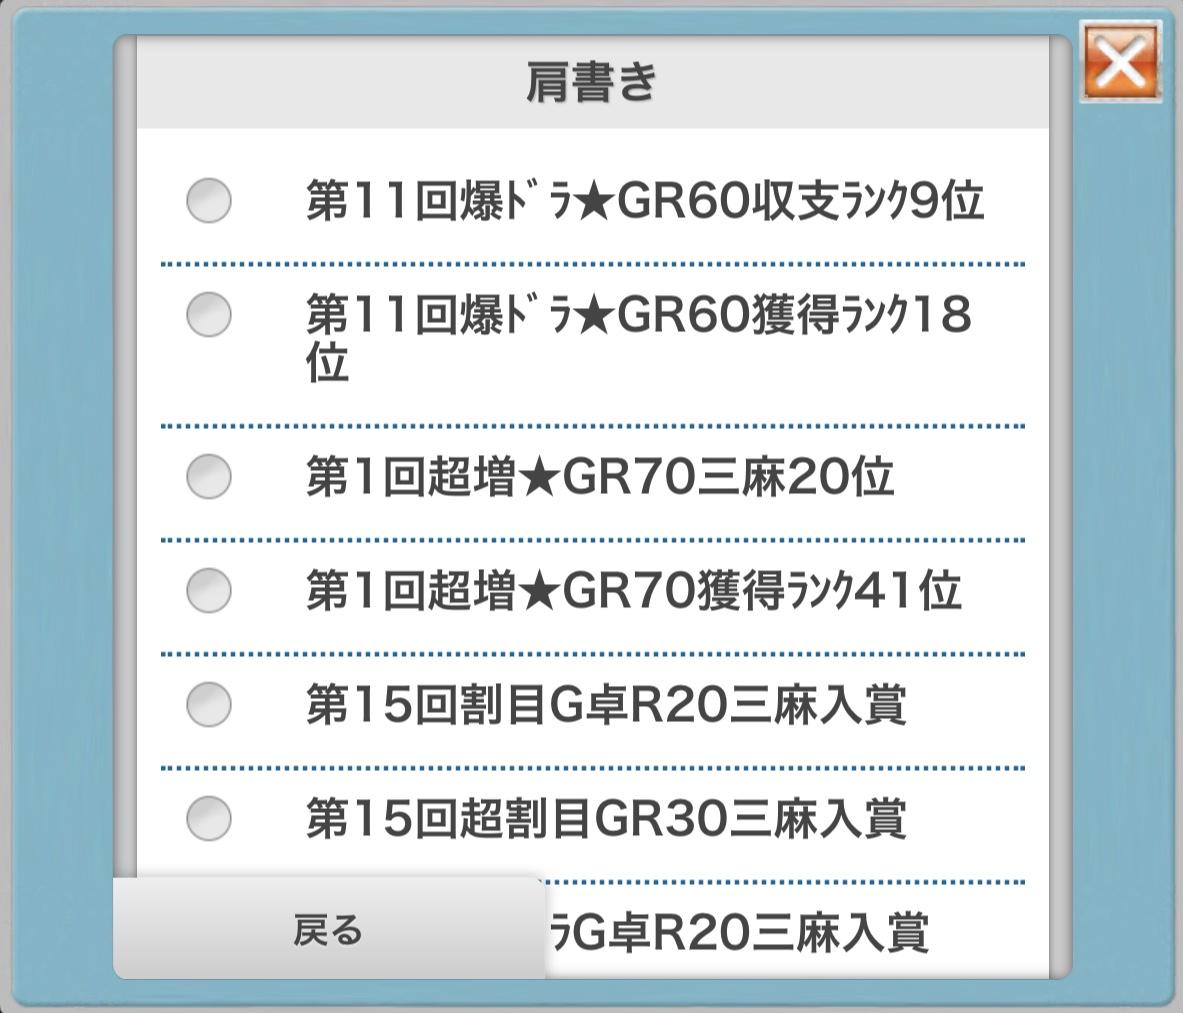 f:id:panage-mid:20200509175826j:plain